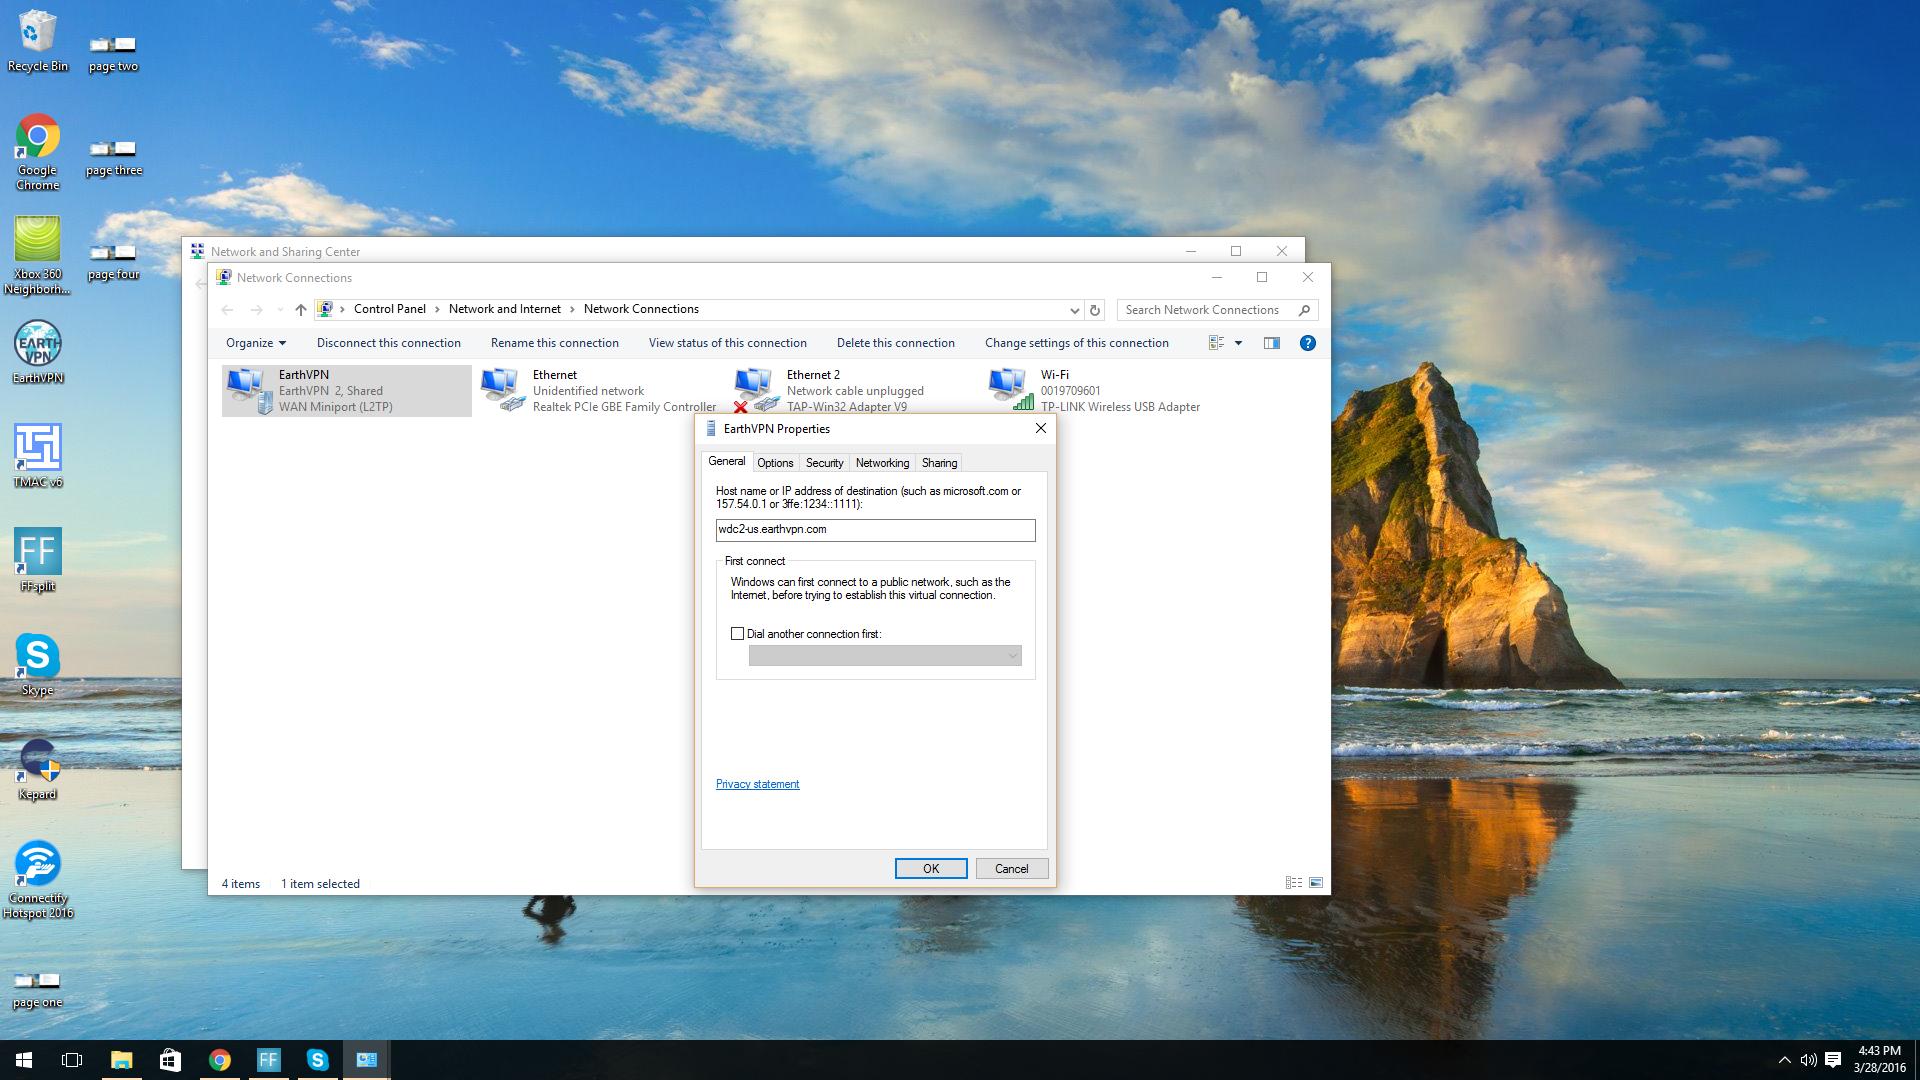 VPN (Internet) Sharing Through Ethernet not Working on Windows 10 ...